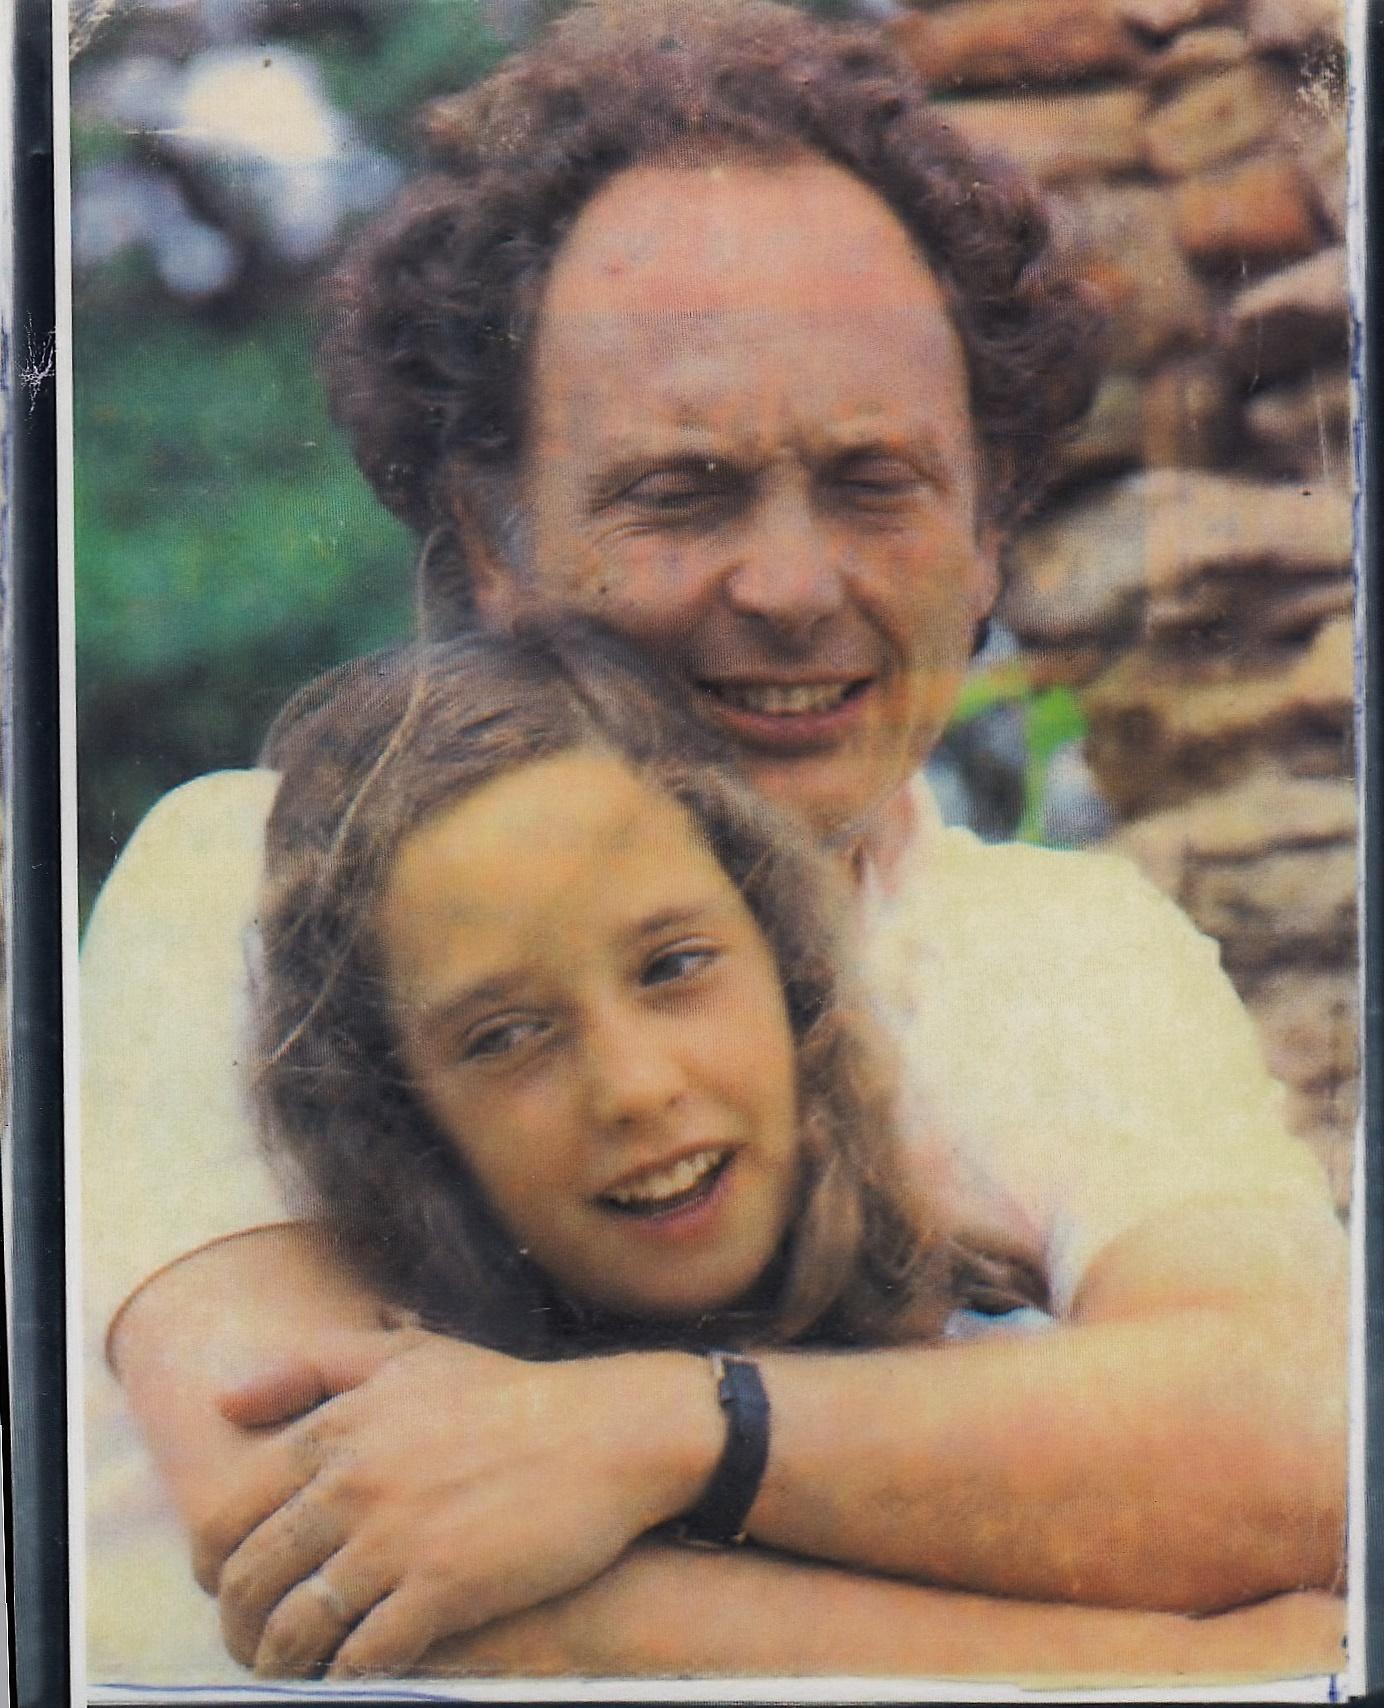 Carolina Punset abrazada por su padre, Eduard Punset, cuando tenía 12 años.